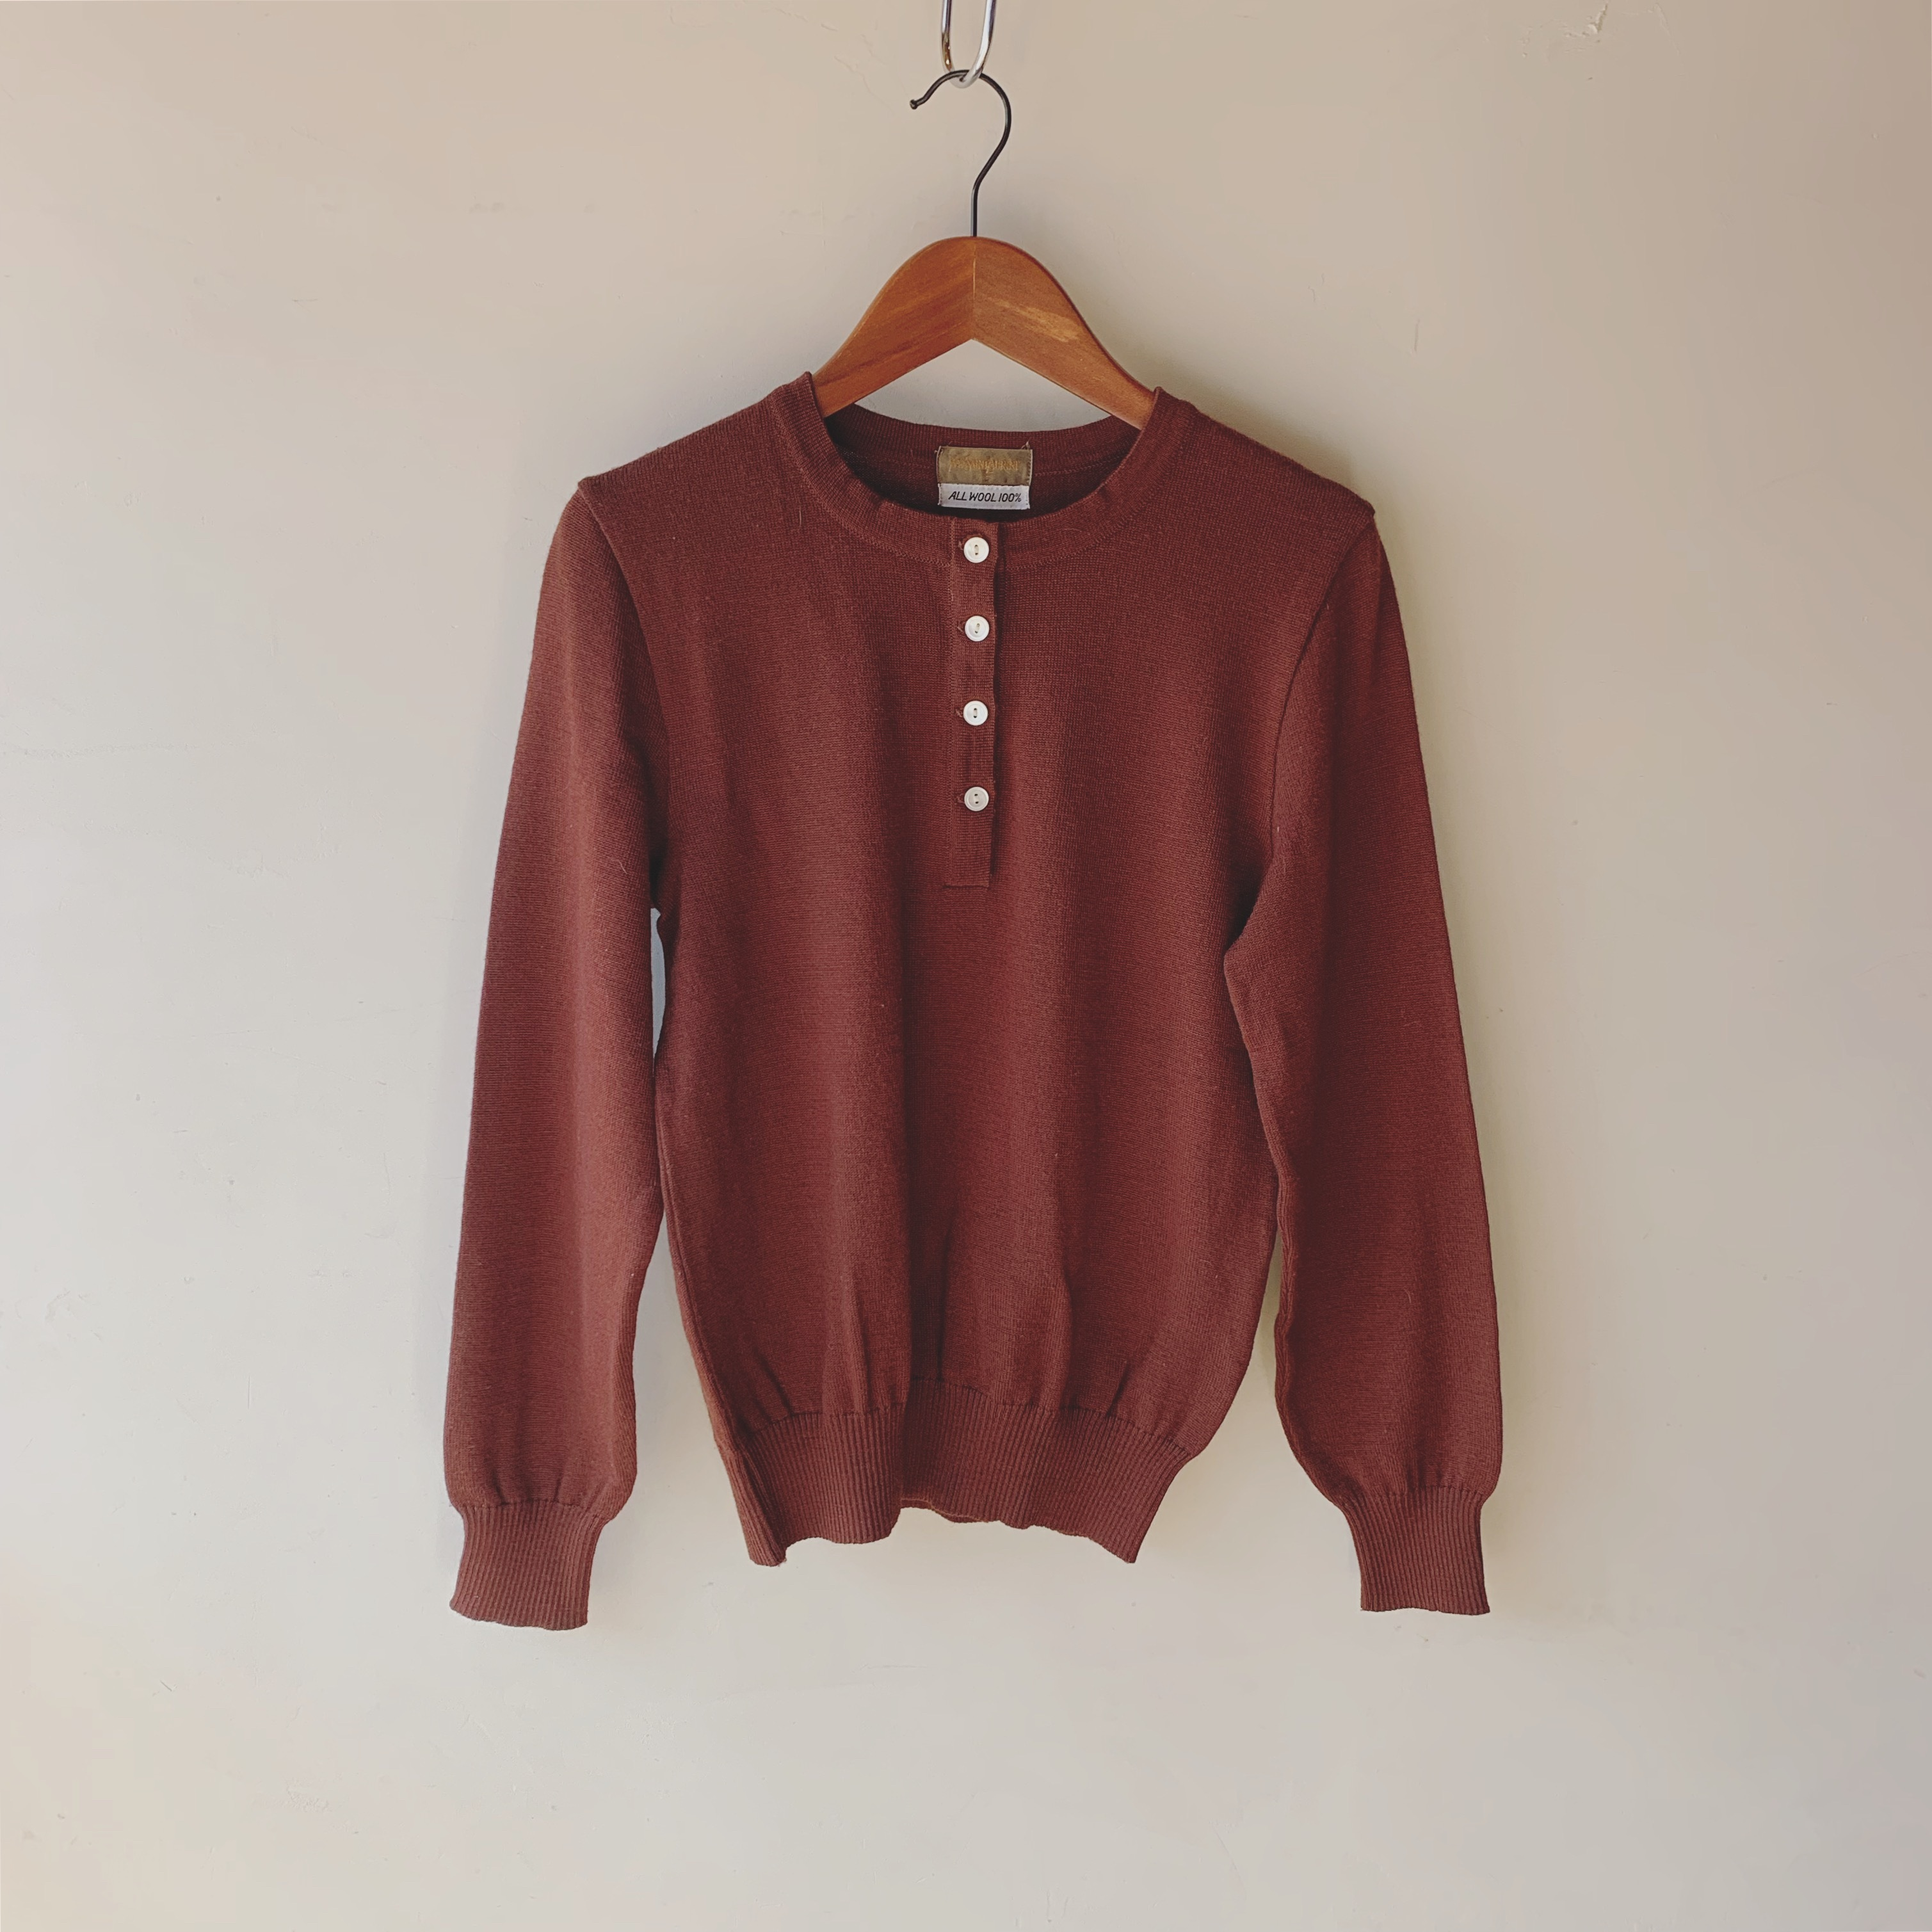 vintage YSL henry neck wool knit tops